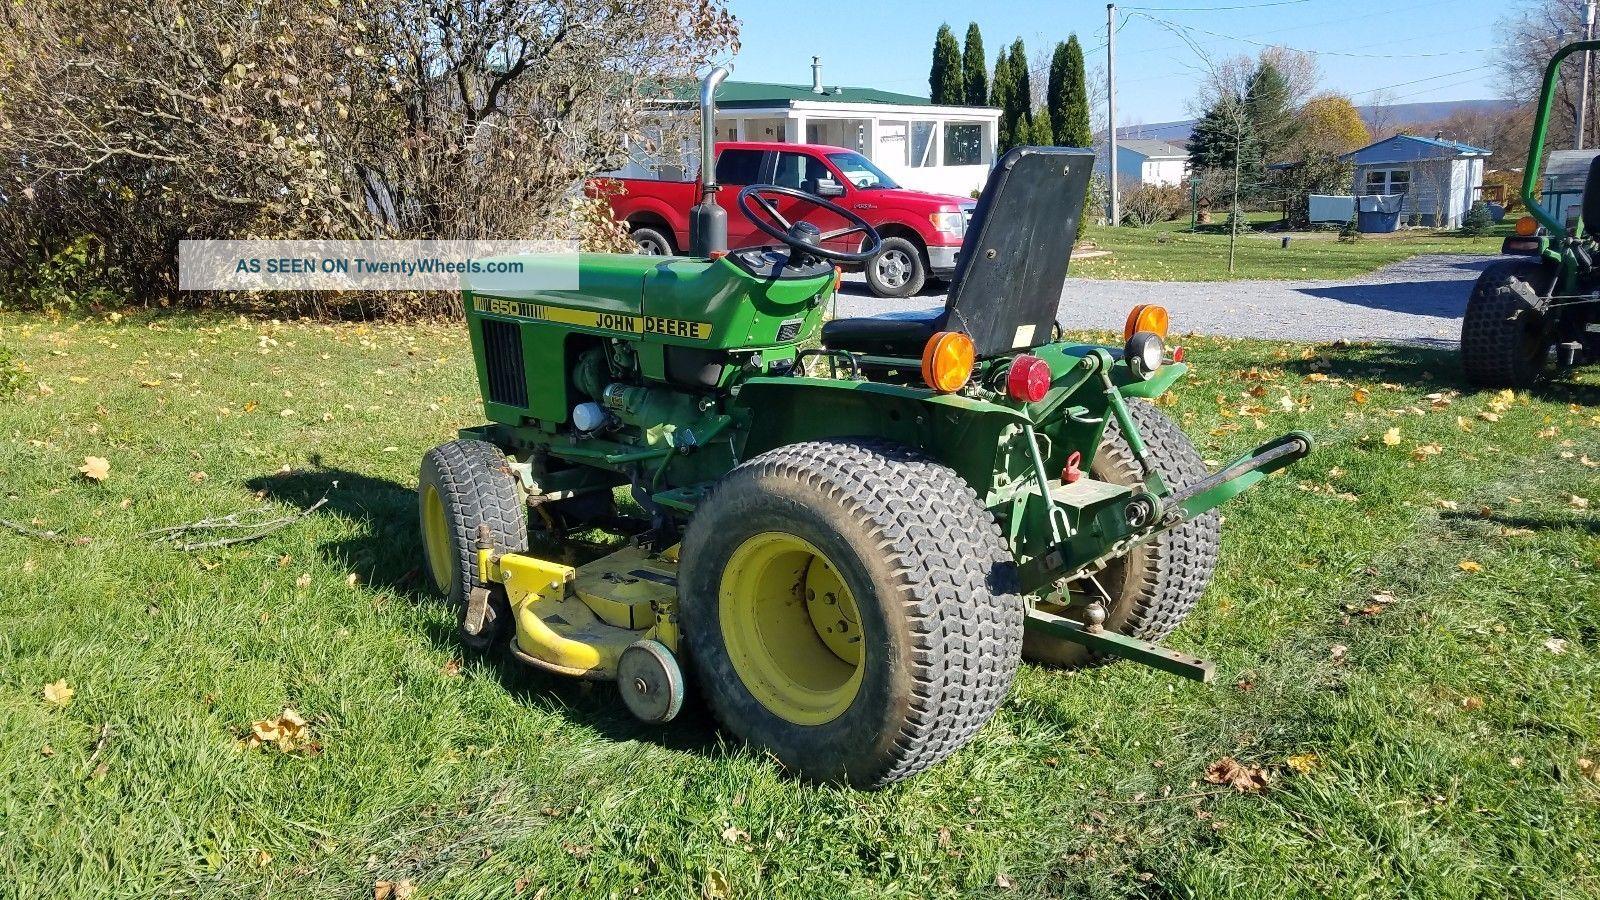 1984 John Deere 650 Garden Tractor Lawn Mower Diesel 16hp Pto Belly Mower